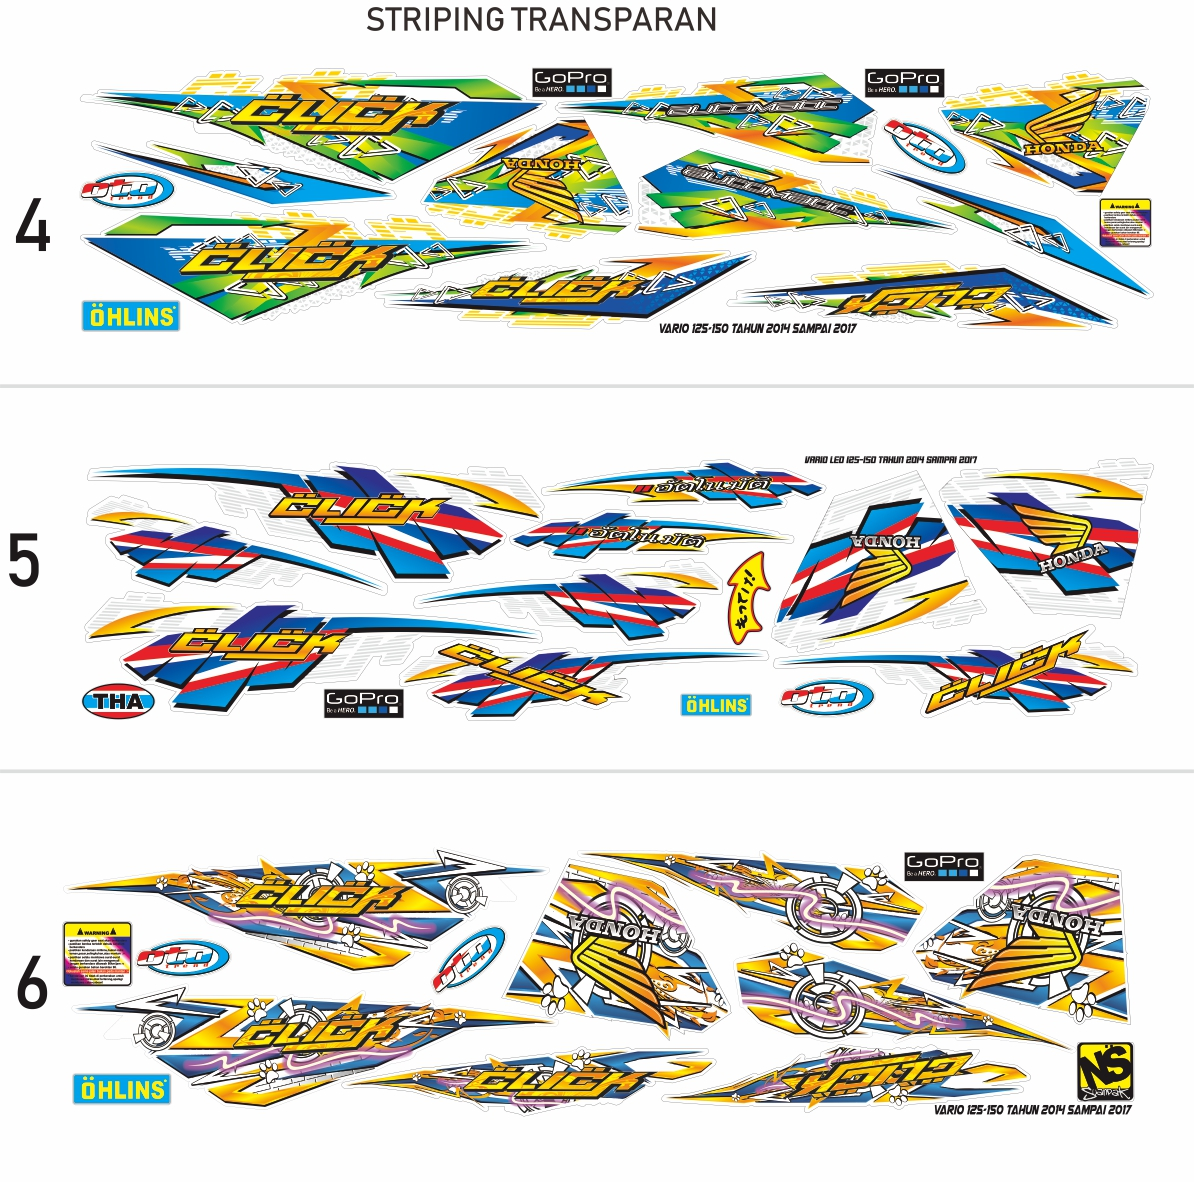 striping honda vario 125cc 150cc tahun --- transparan uv list sticker variasi honda vario led disen3